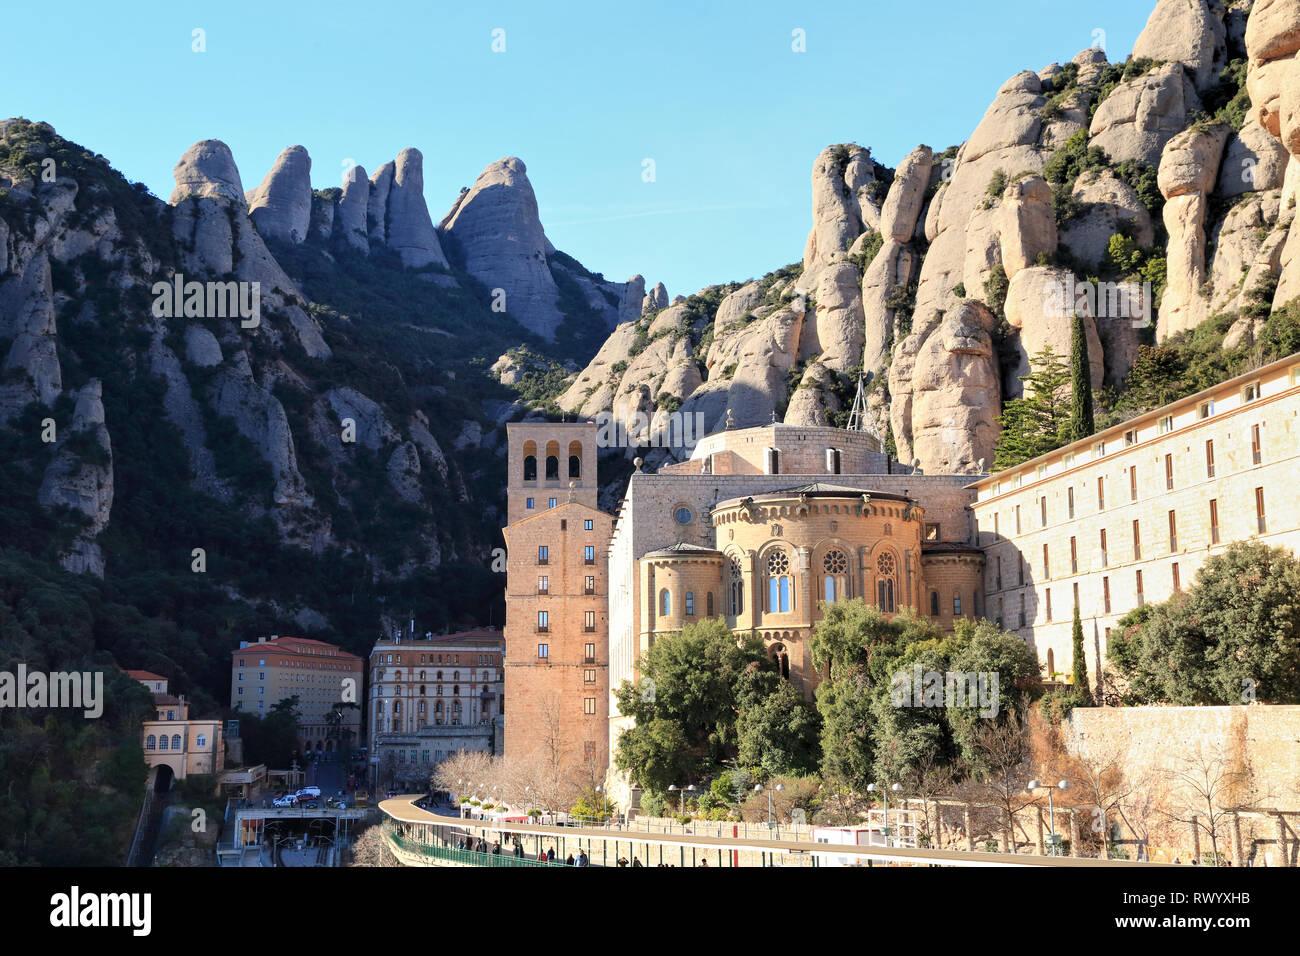 Abbey of Montserrat monastery, Santa Maria de Montserrat, Catalonia, Spain Stock Photo